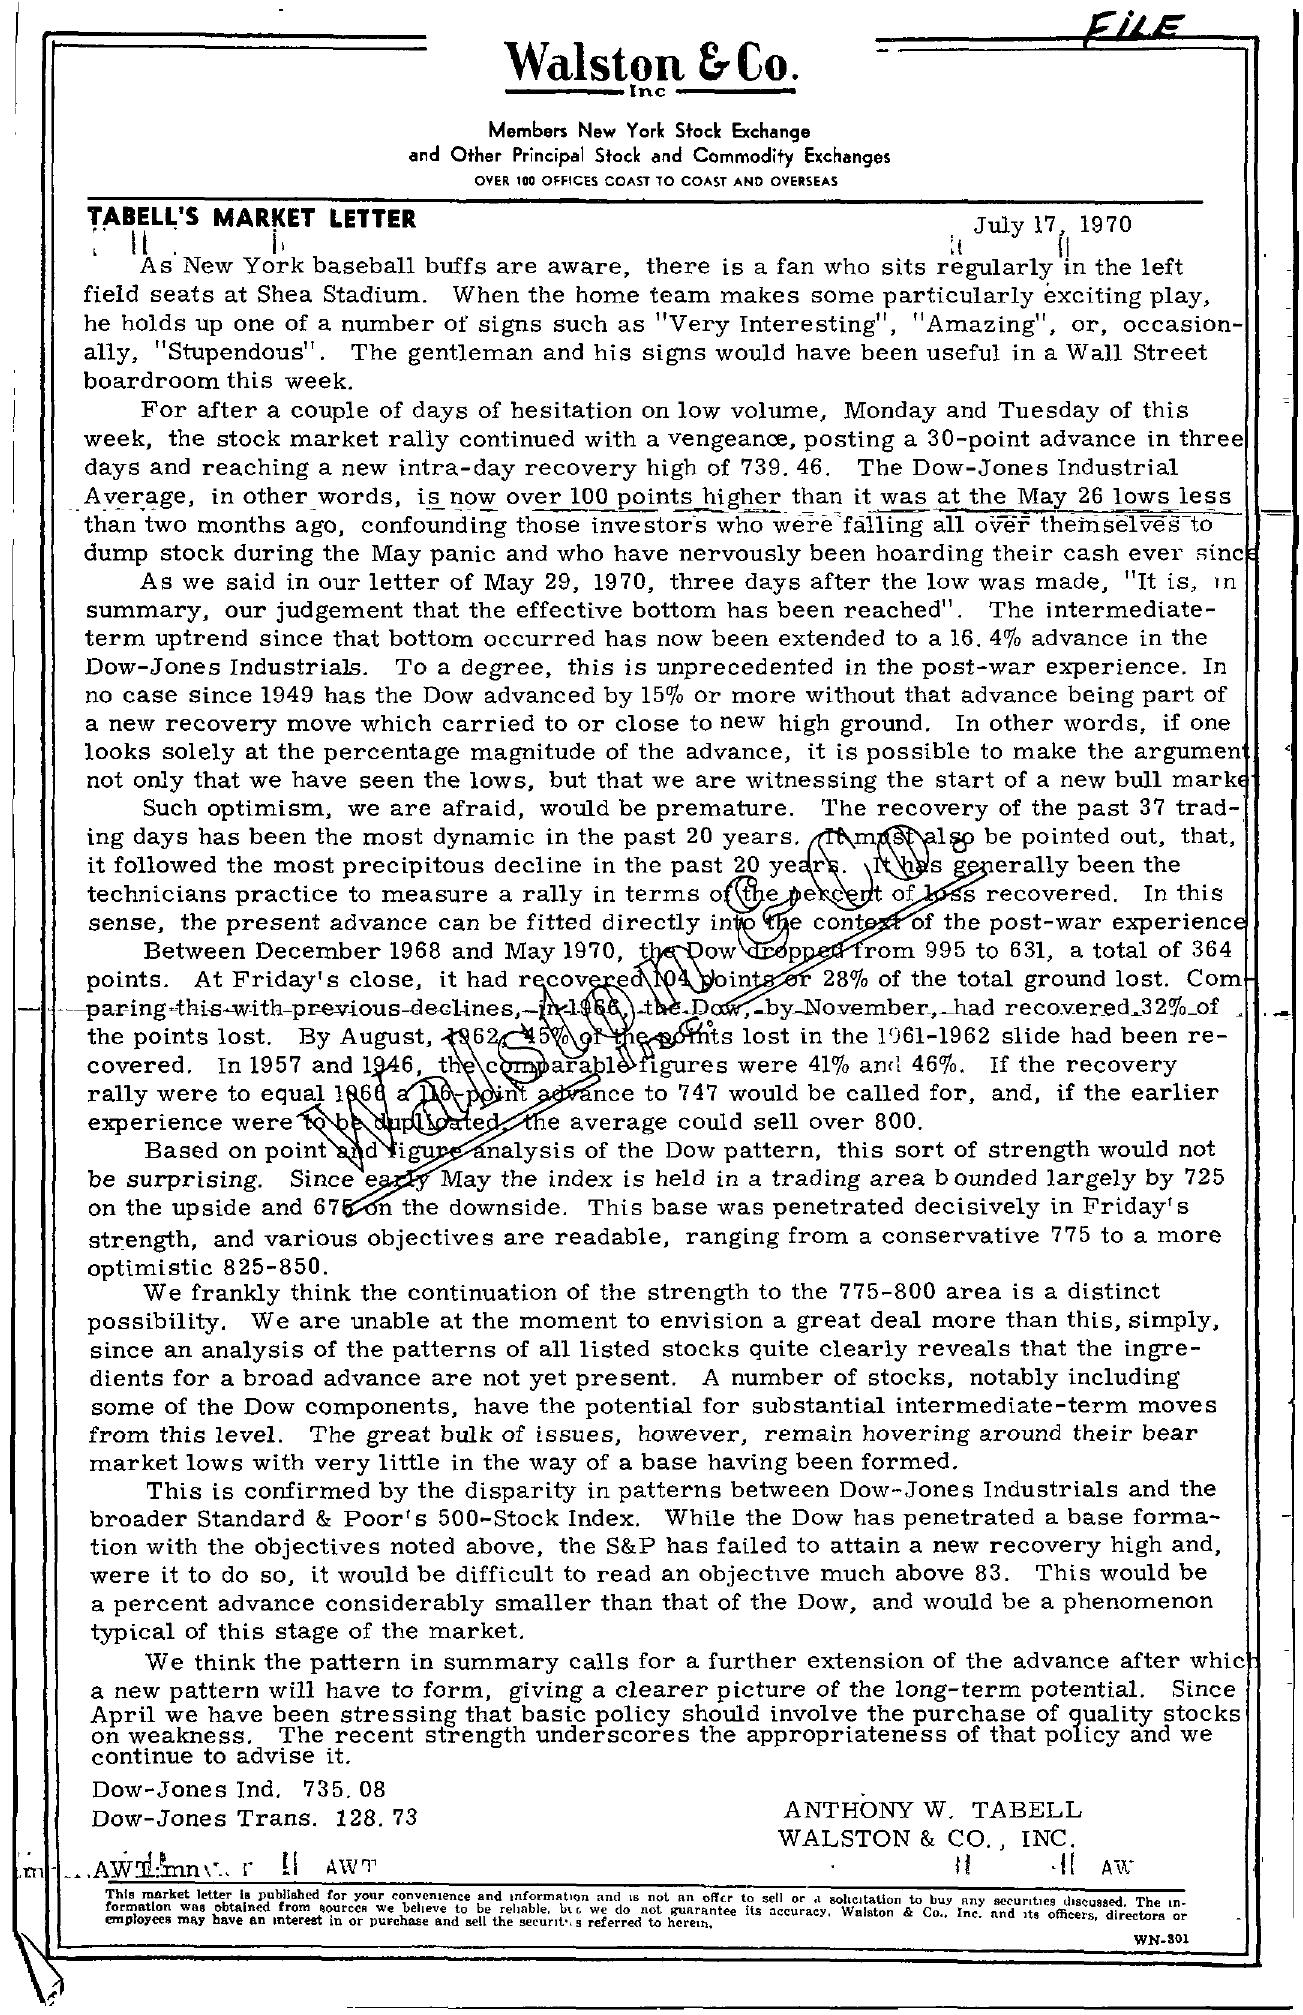 Tabell's Market Letter - July 17, 1970